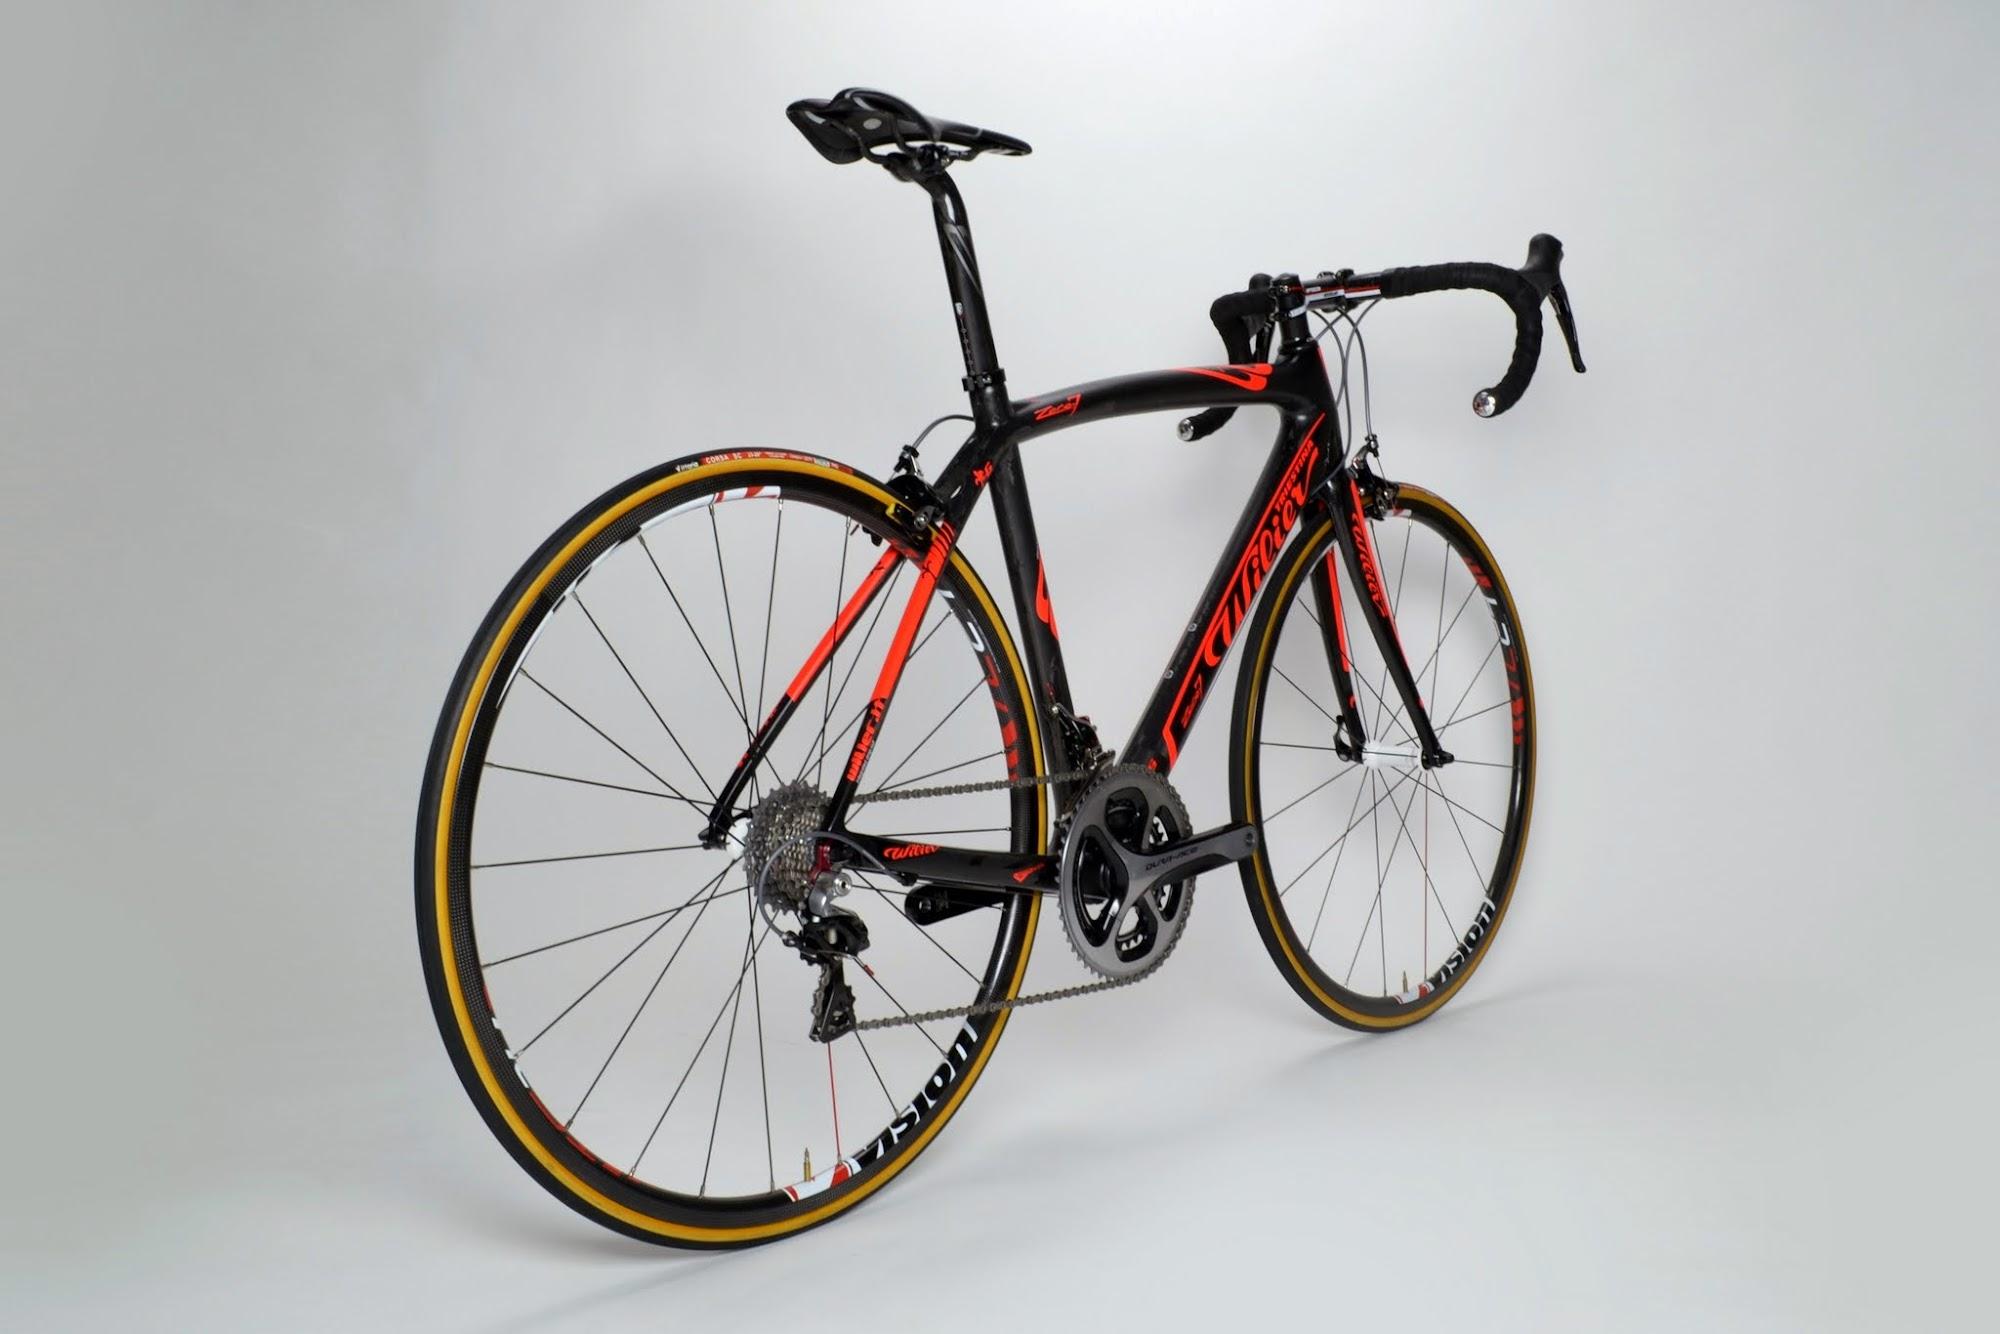 www.twohubs.com: 2014 Team Colombia Wilier Triestina Zero.7 Complete Bike at twohubs.com